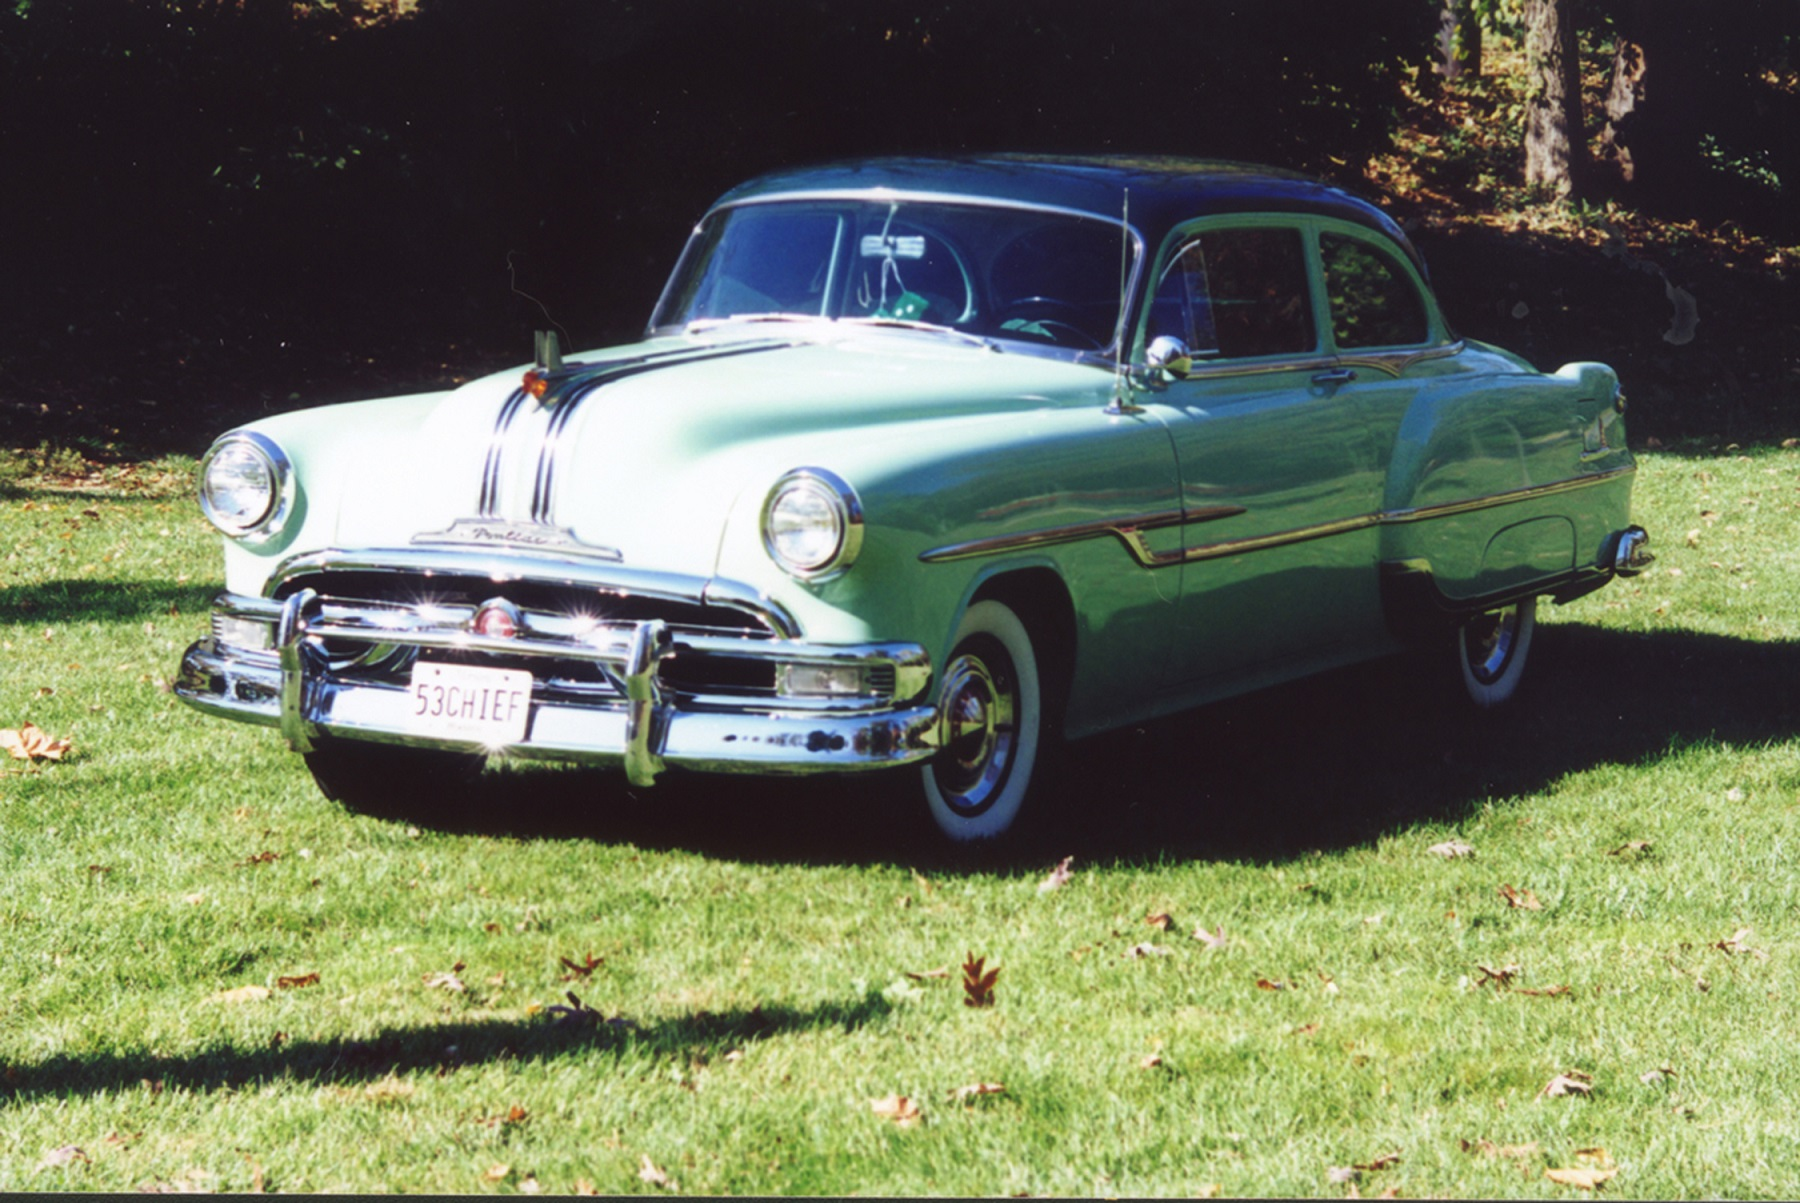 Movie inspires acquisition of 1953 Pontiac Chieftain